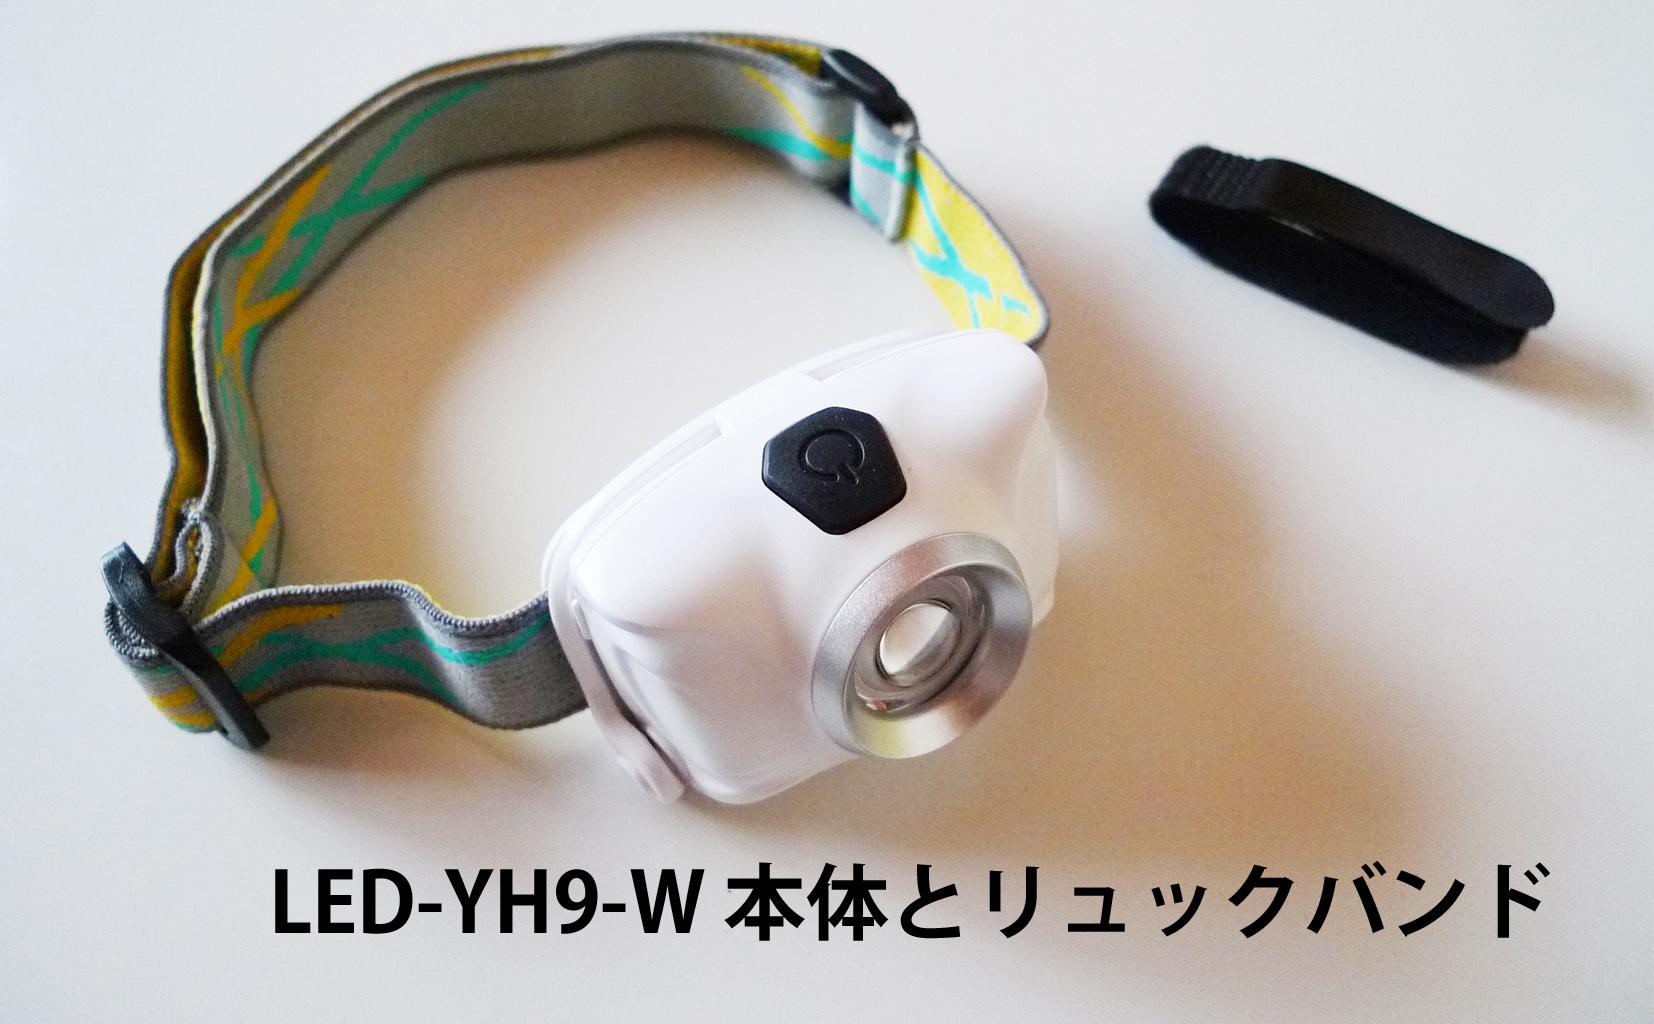 blog LED-YH9-W 0003